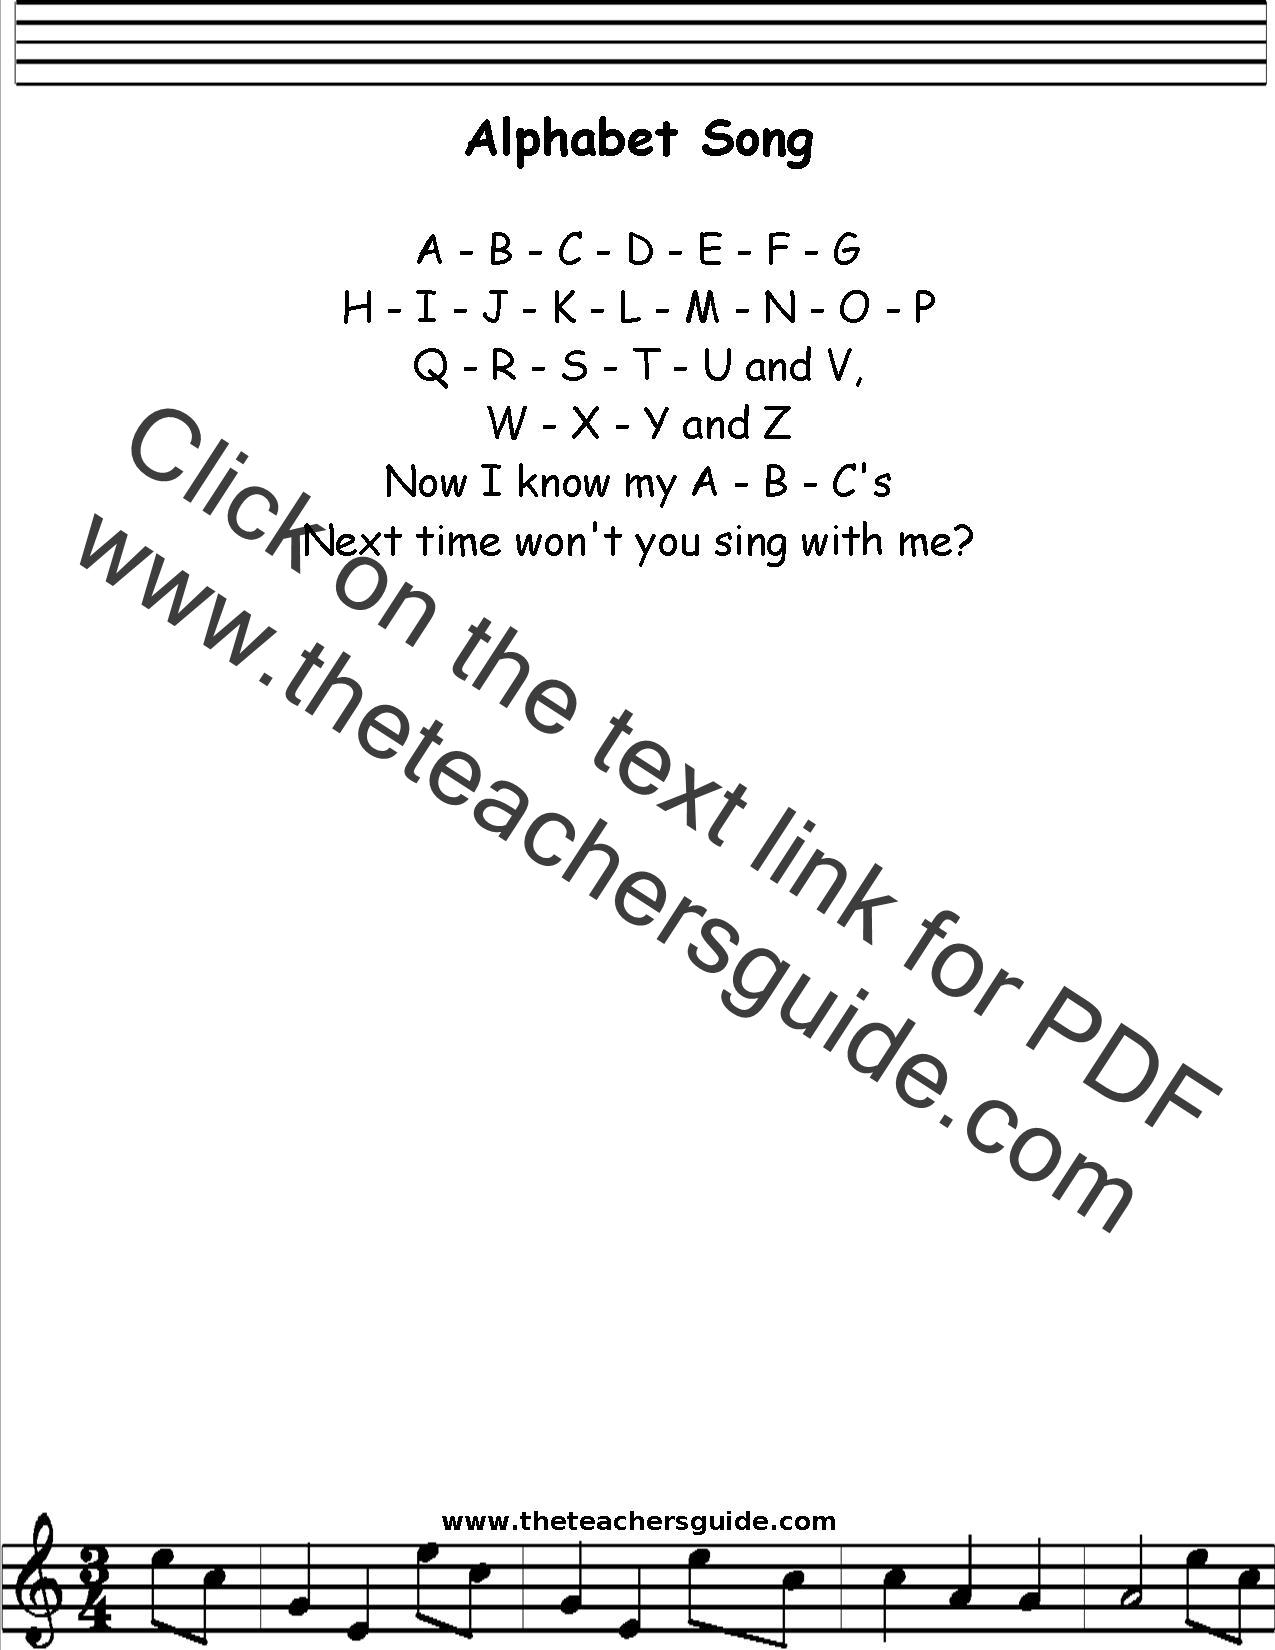 Alphabet Song Lyrics Printout Midi And Video